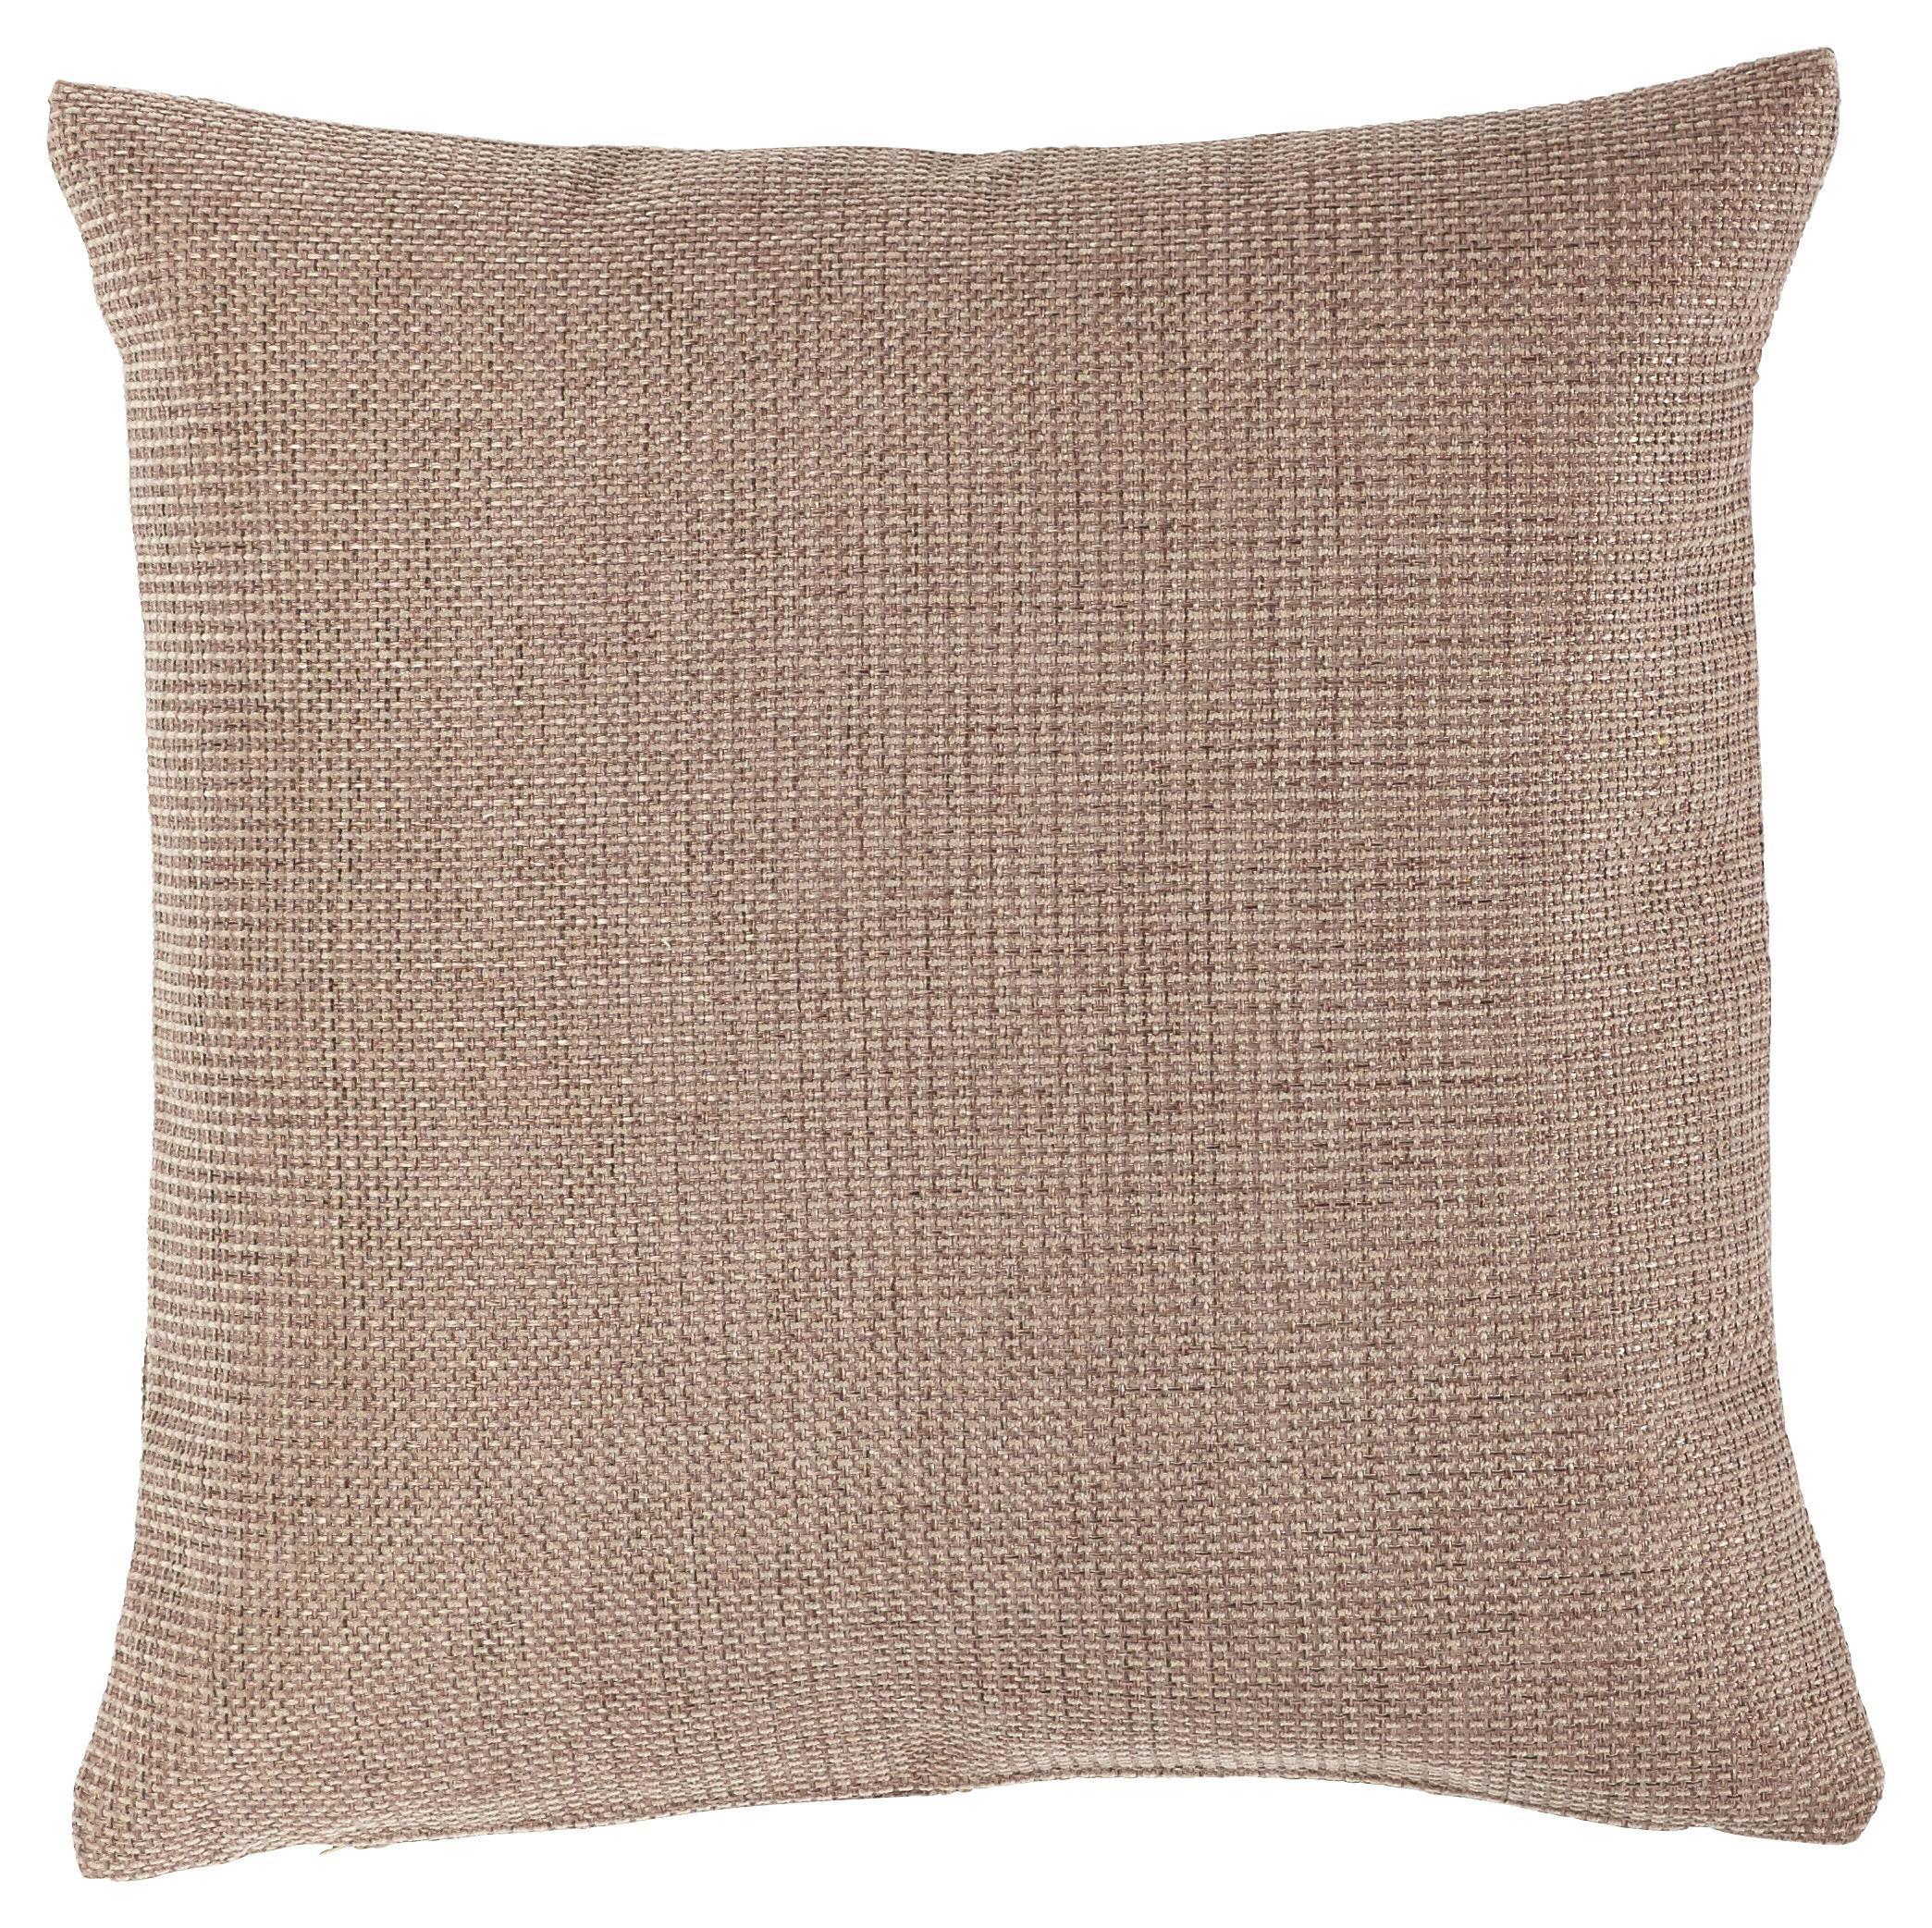 KISSENHÜLLE Taupe 60/60 cm - Taupe, Basics, Textil (60/60cm)